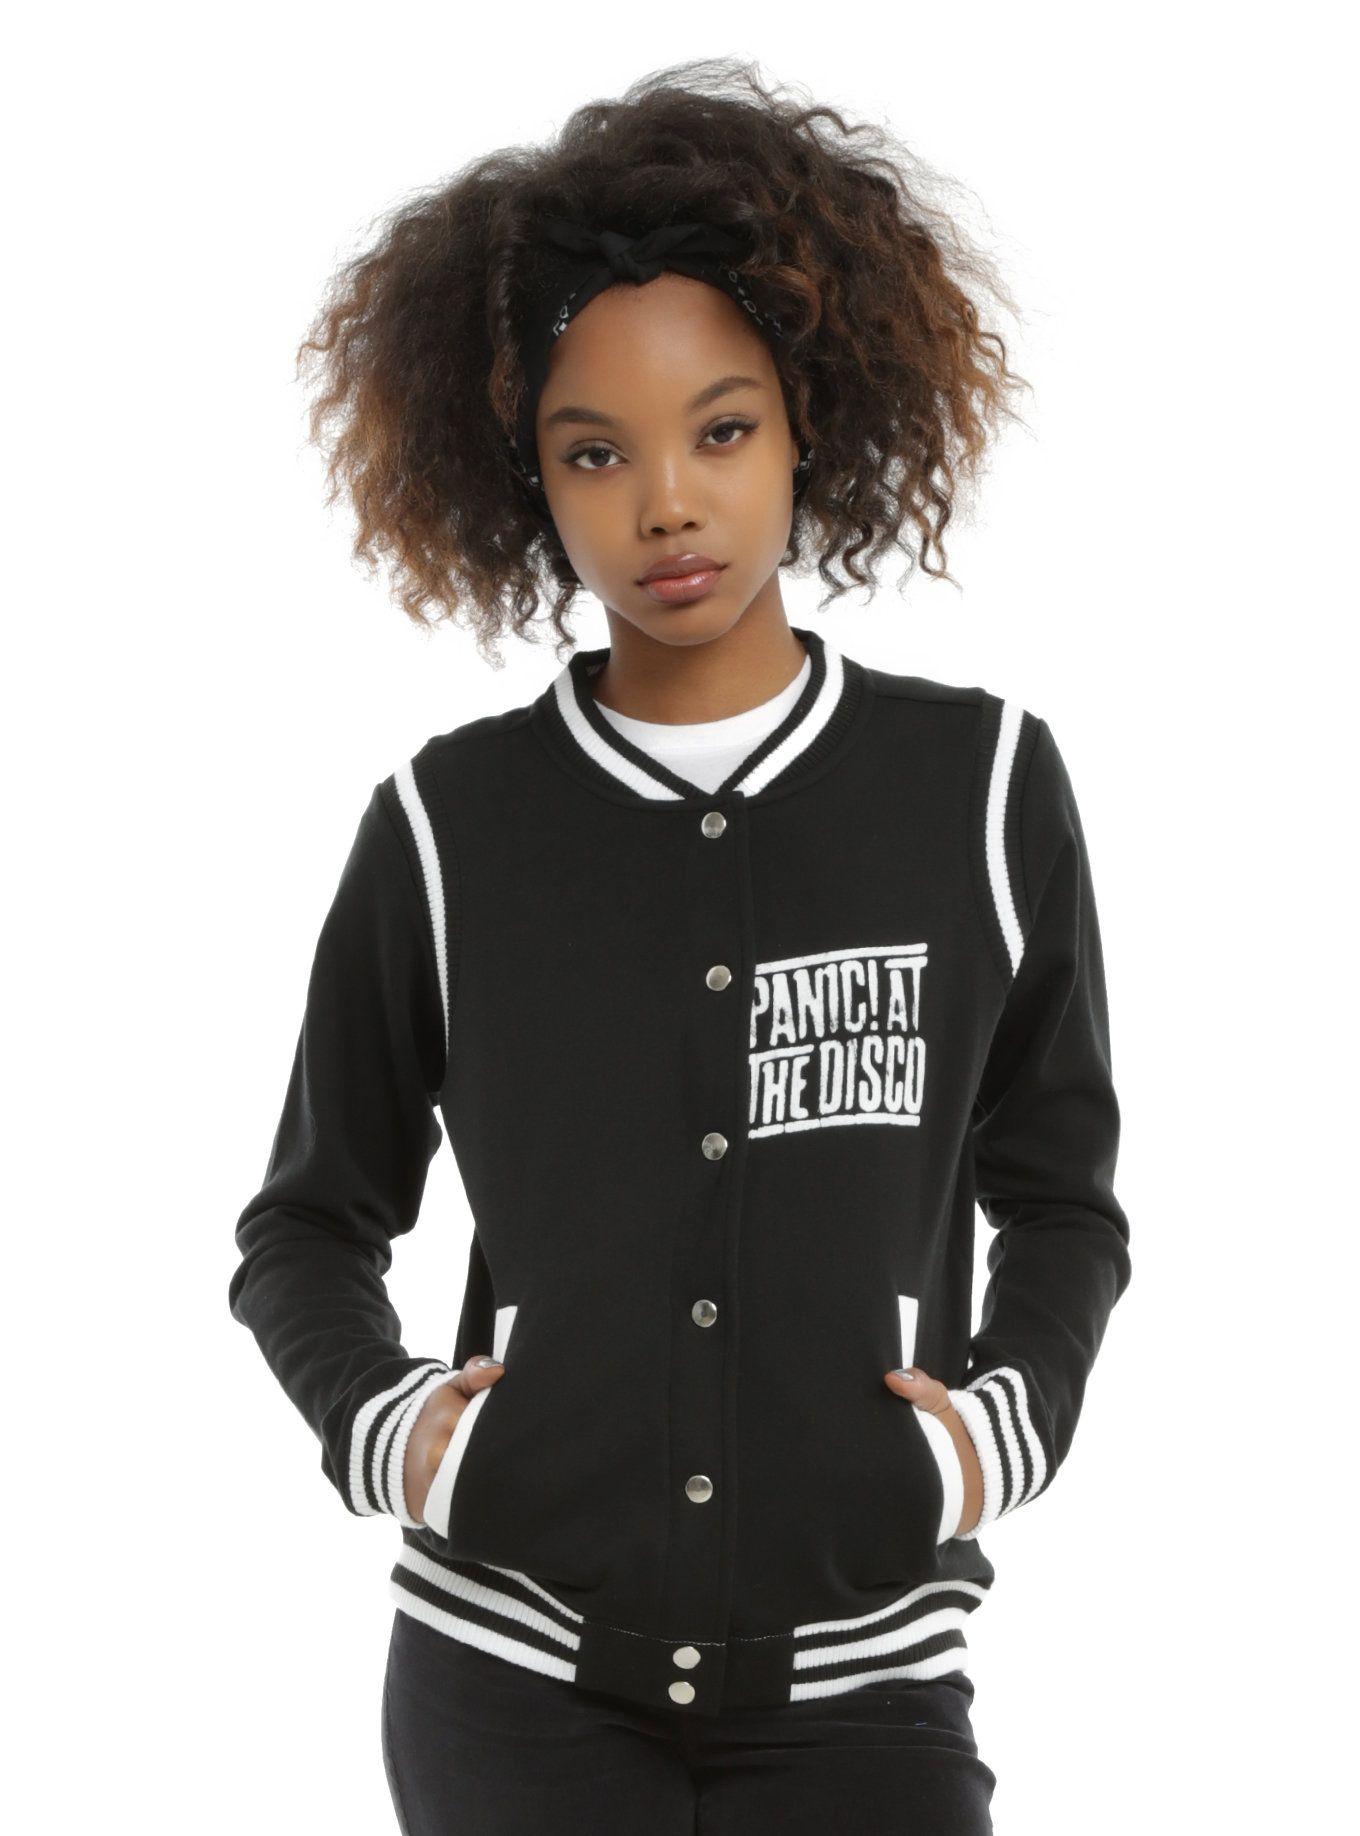 b1191108 Panic At The Disco Girls Varsity Jacket   Hot Topic